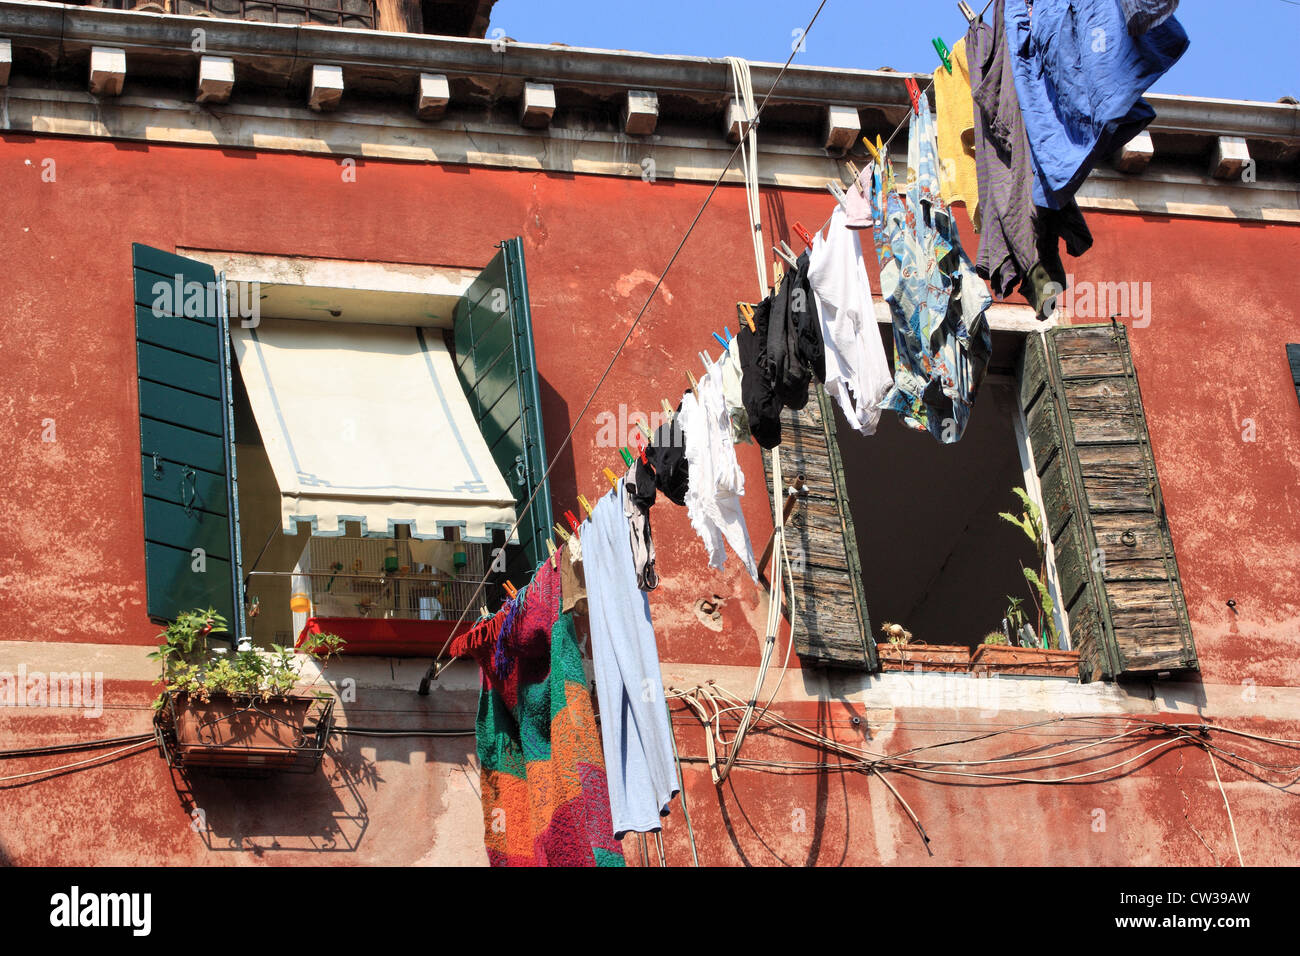 Clothesline Italy - Stock Image